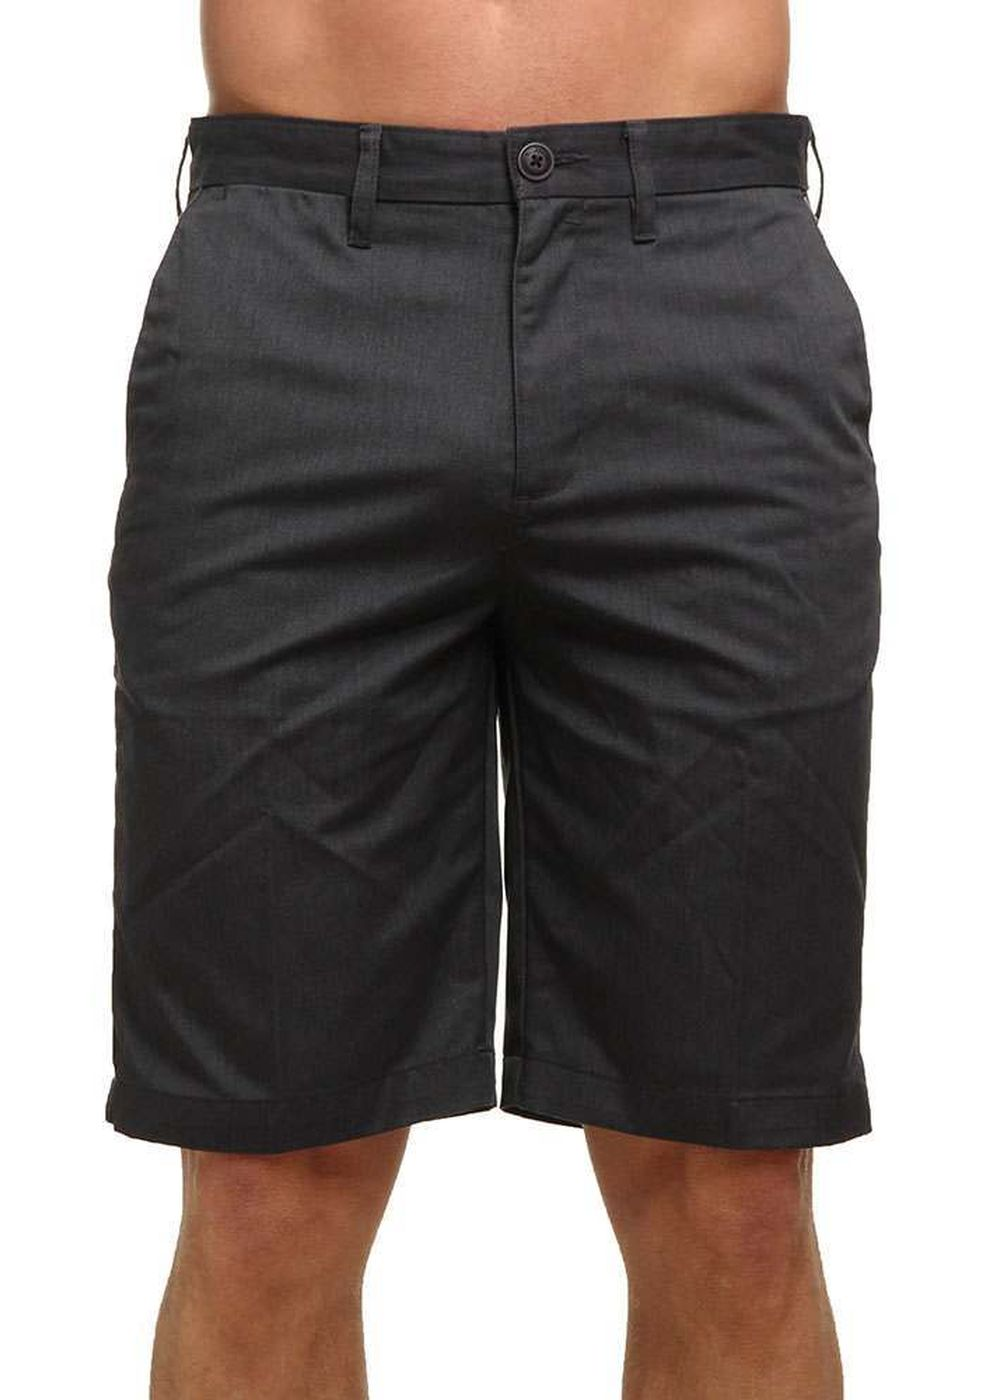 billabong-carter-shorts-charcoal-heather